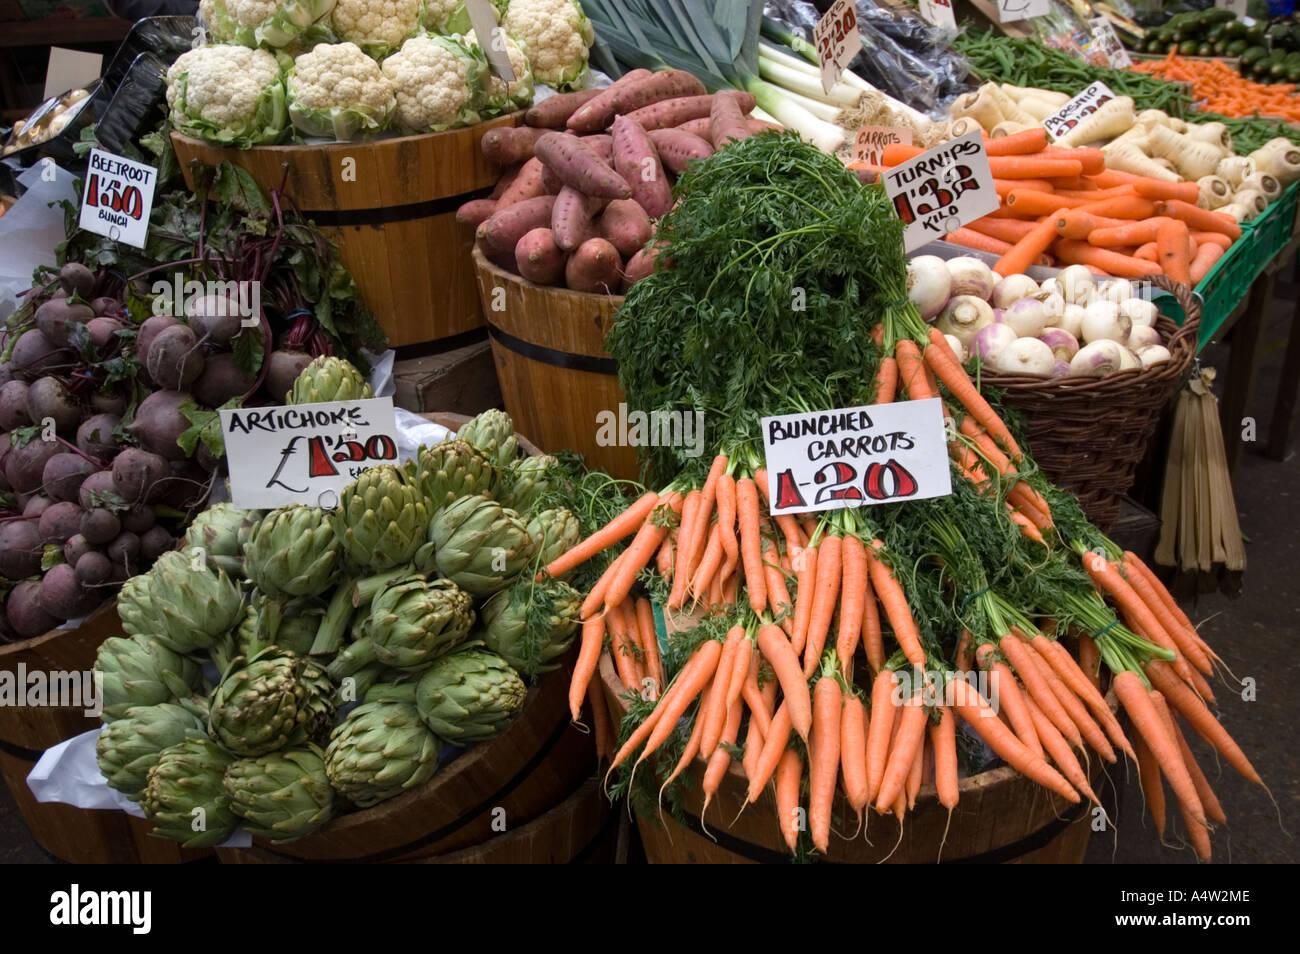 London Food Market Food Stalls Fresh Produce